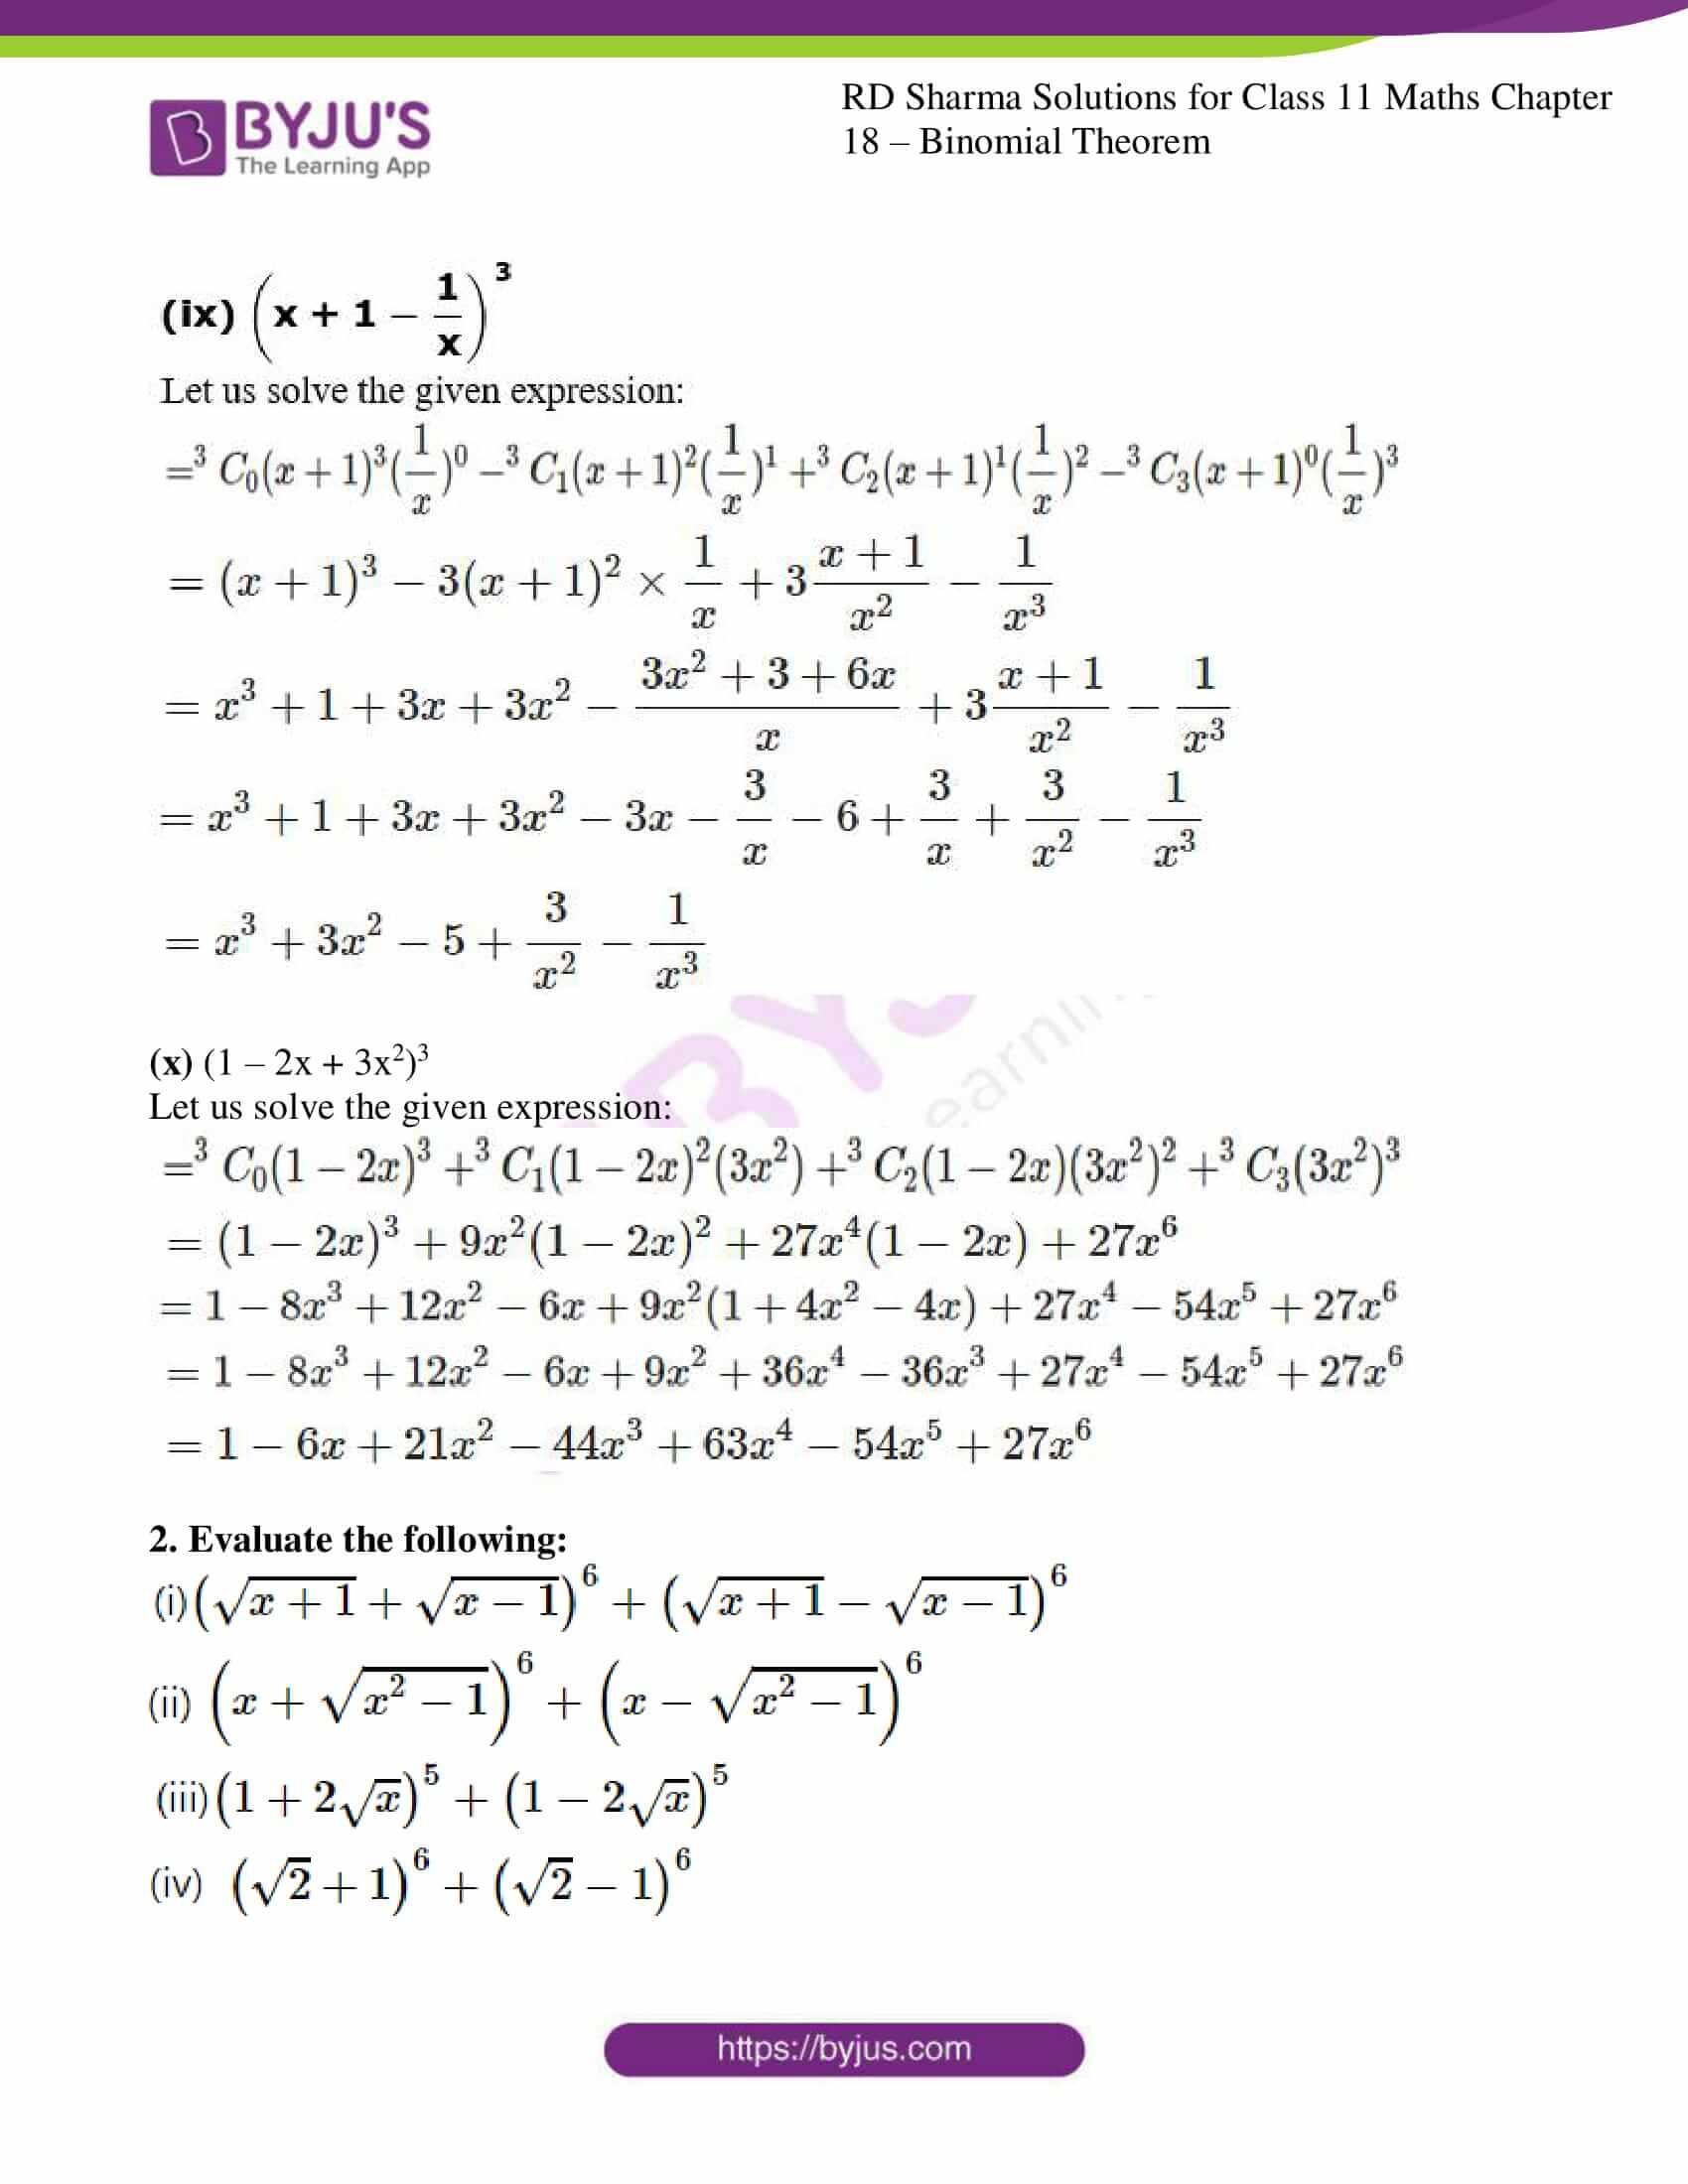 rd sharma class 11 maths ch 18 ex 1 04